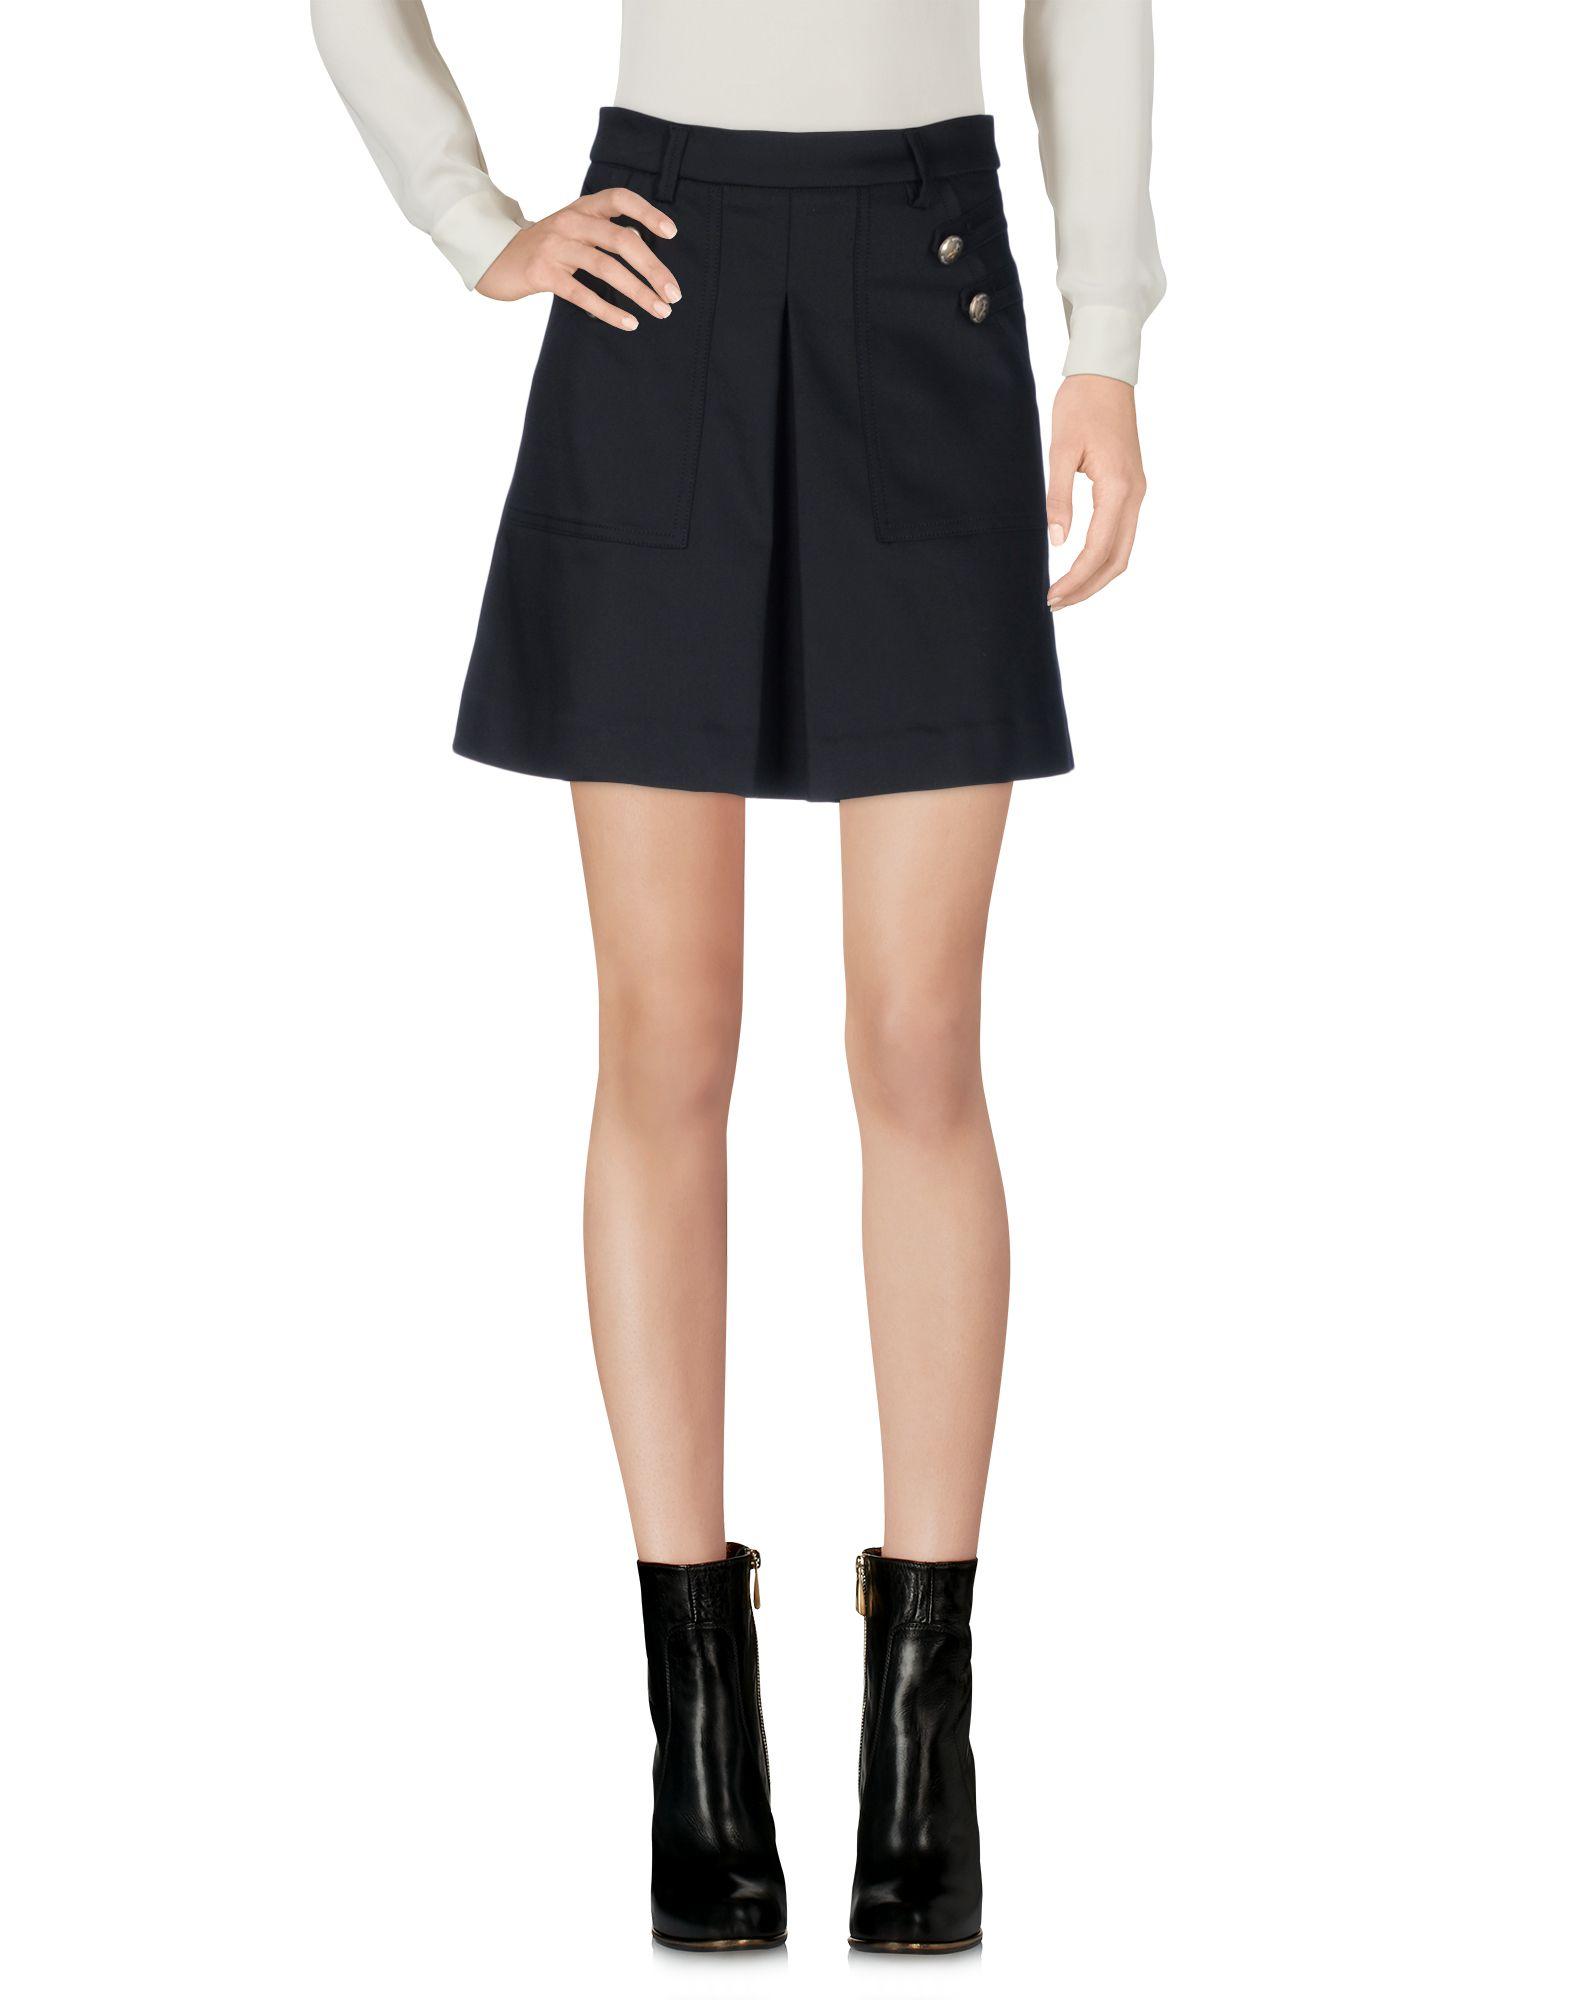 PATRIZIA PEPE Damen Minirock Farbe Schwarz Größe 6